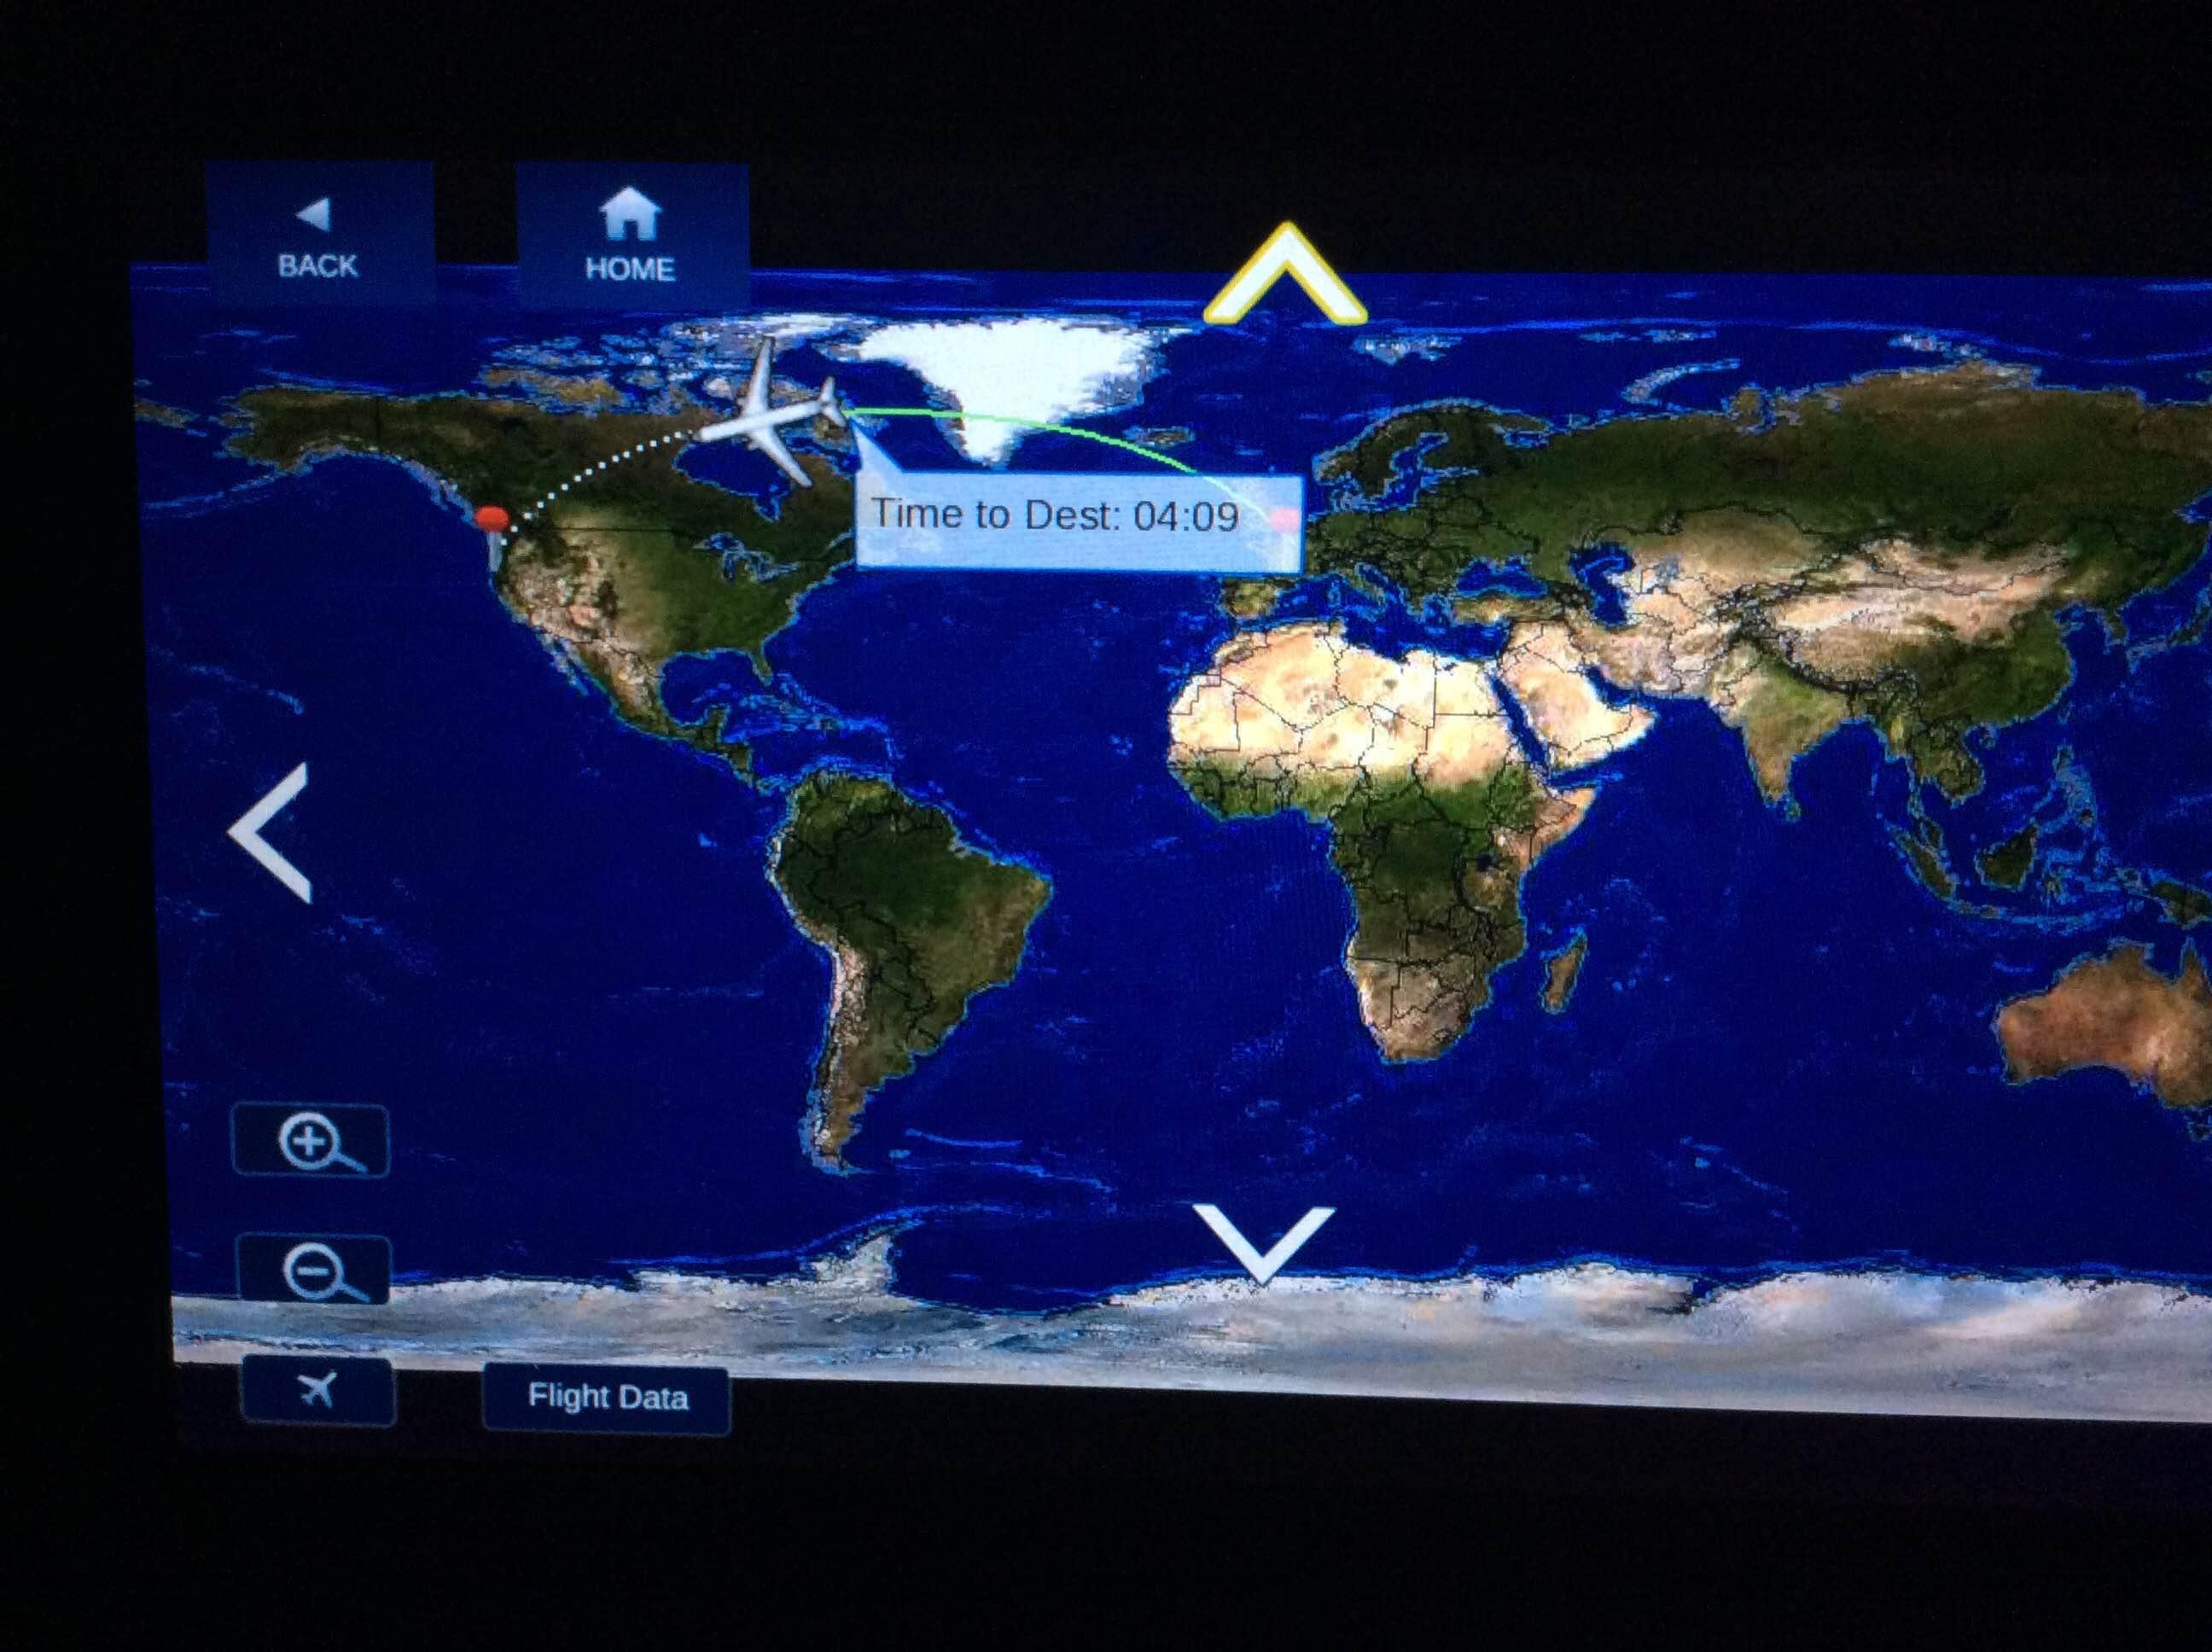 Building a Website at 36,000 Feet